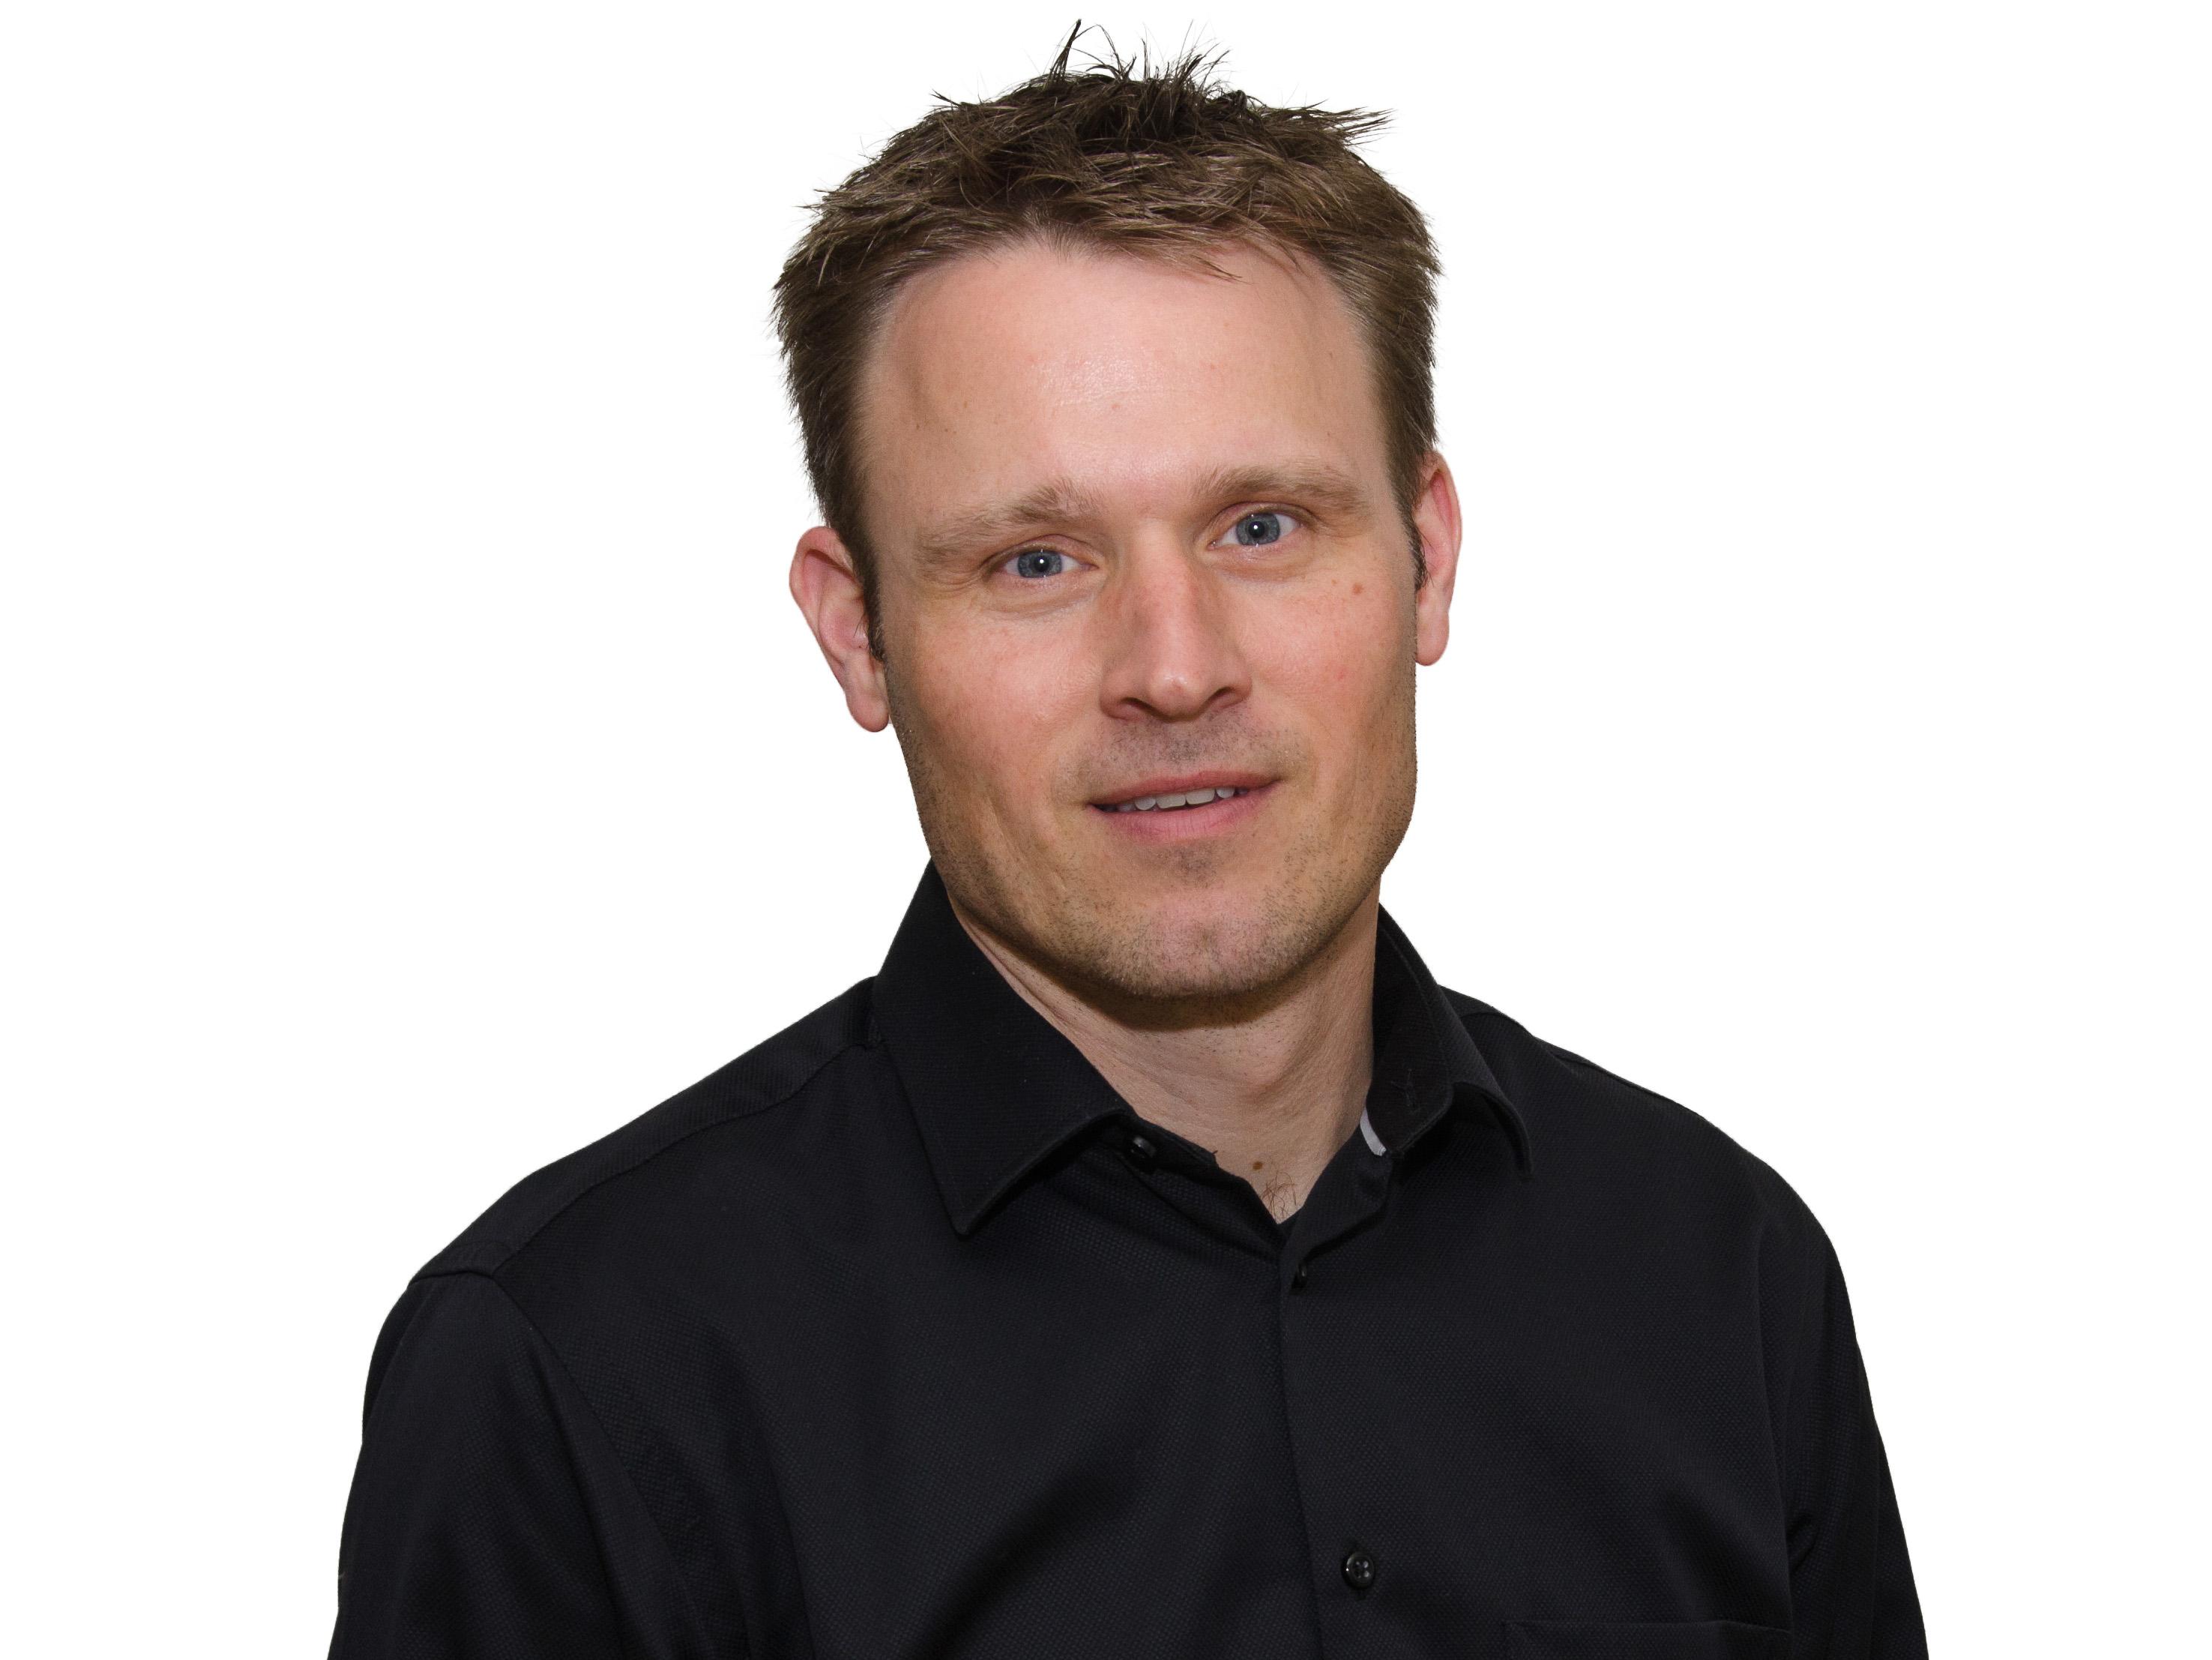 Martin Hüsler